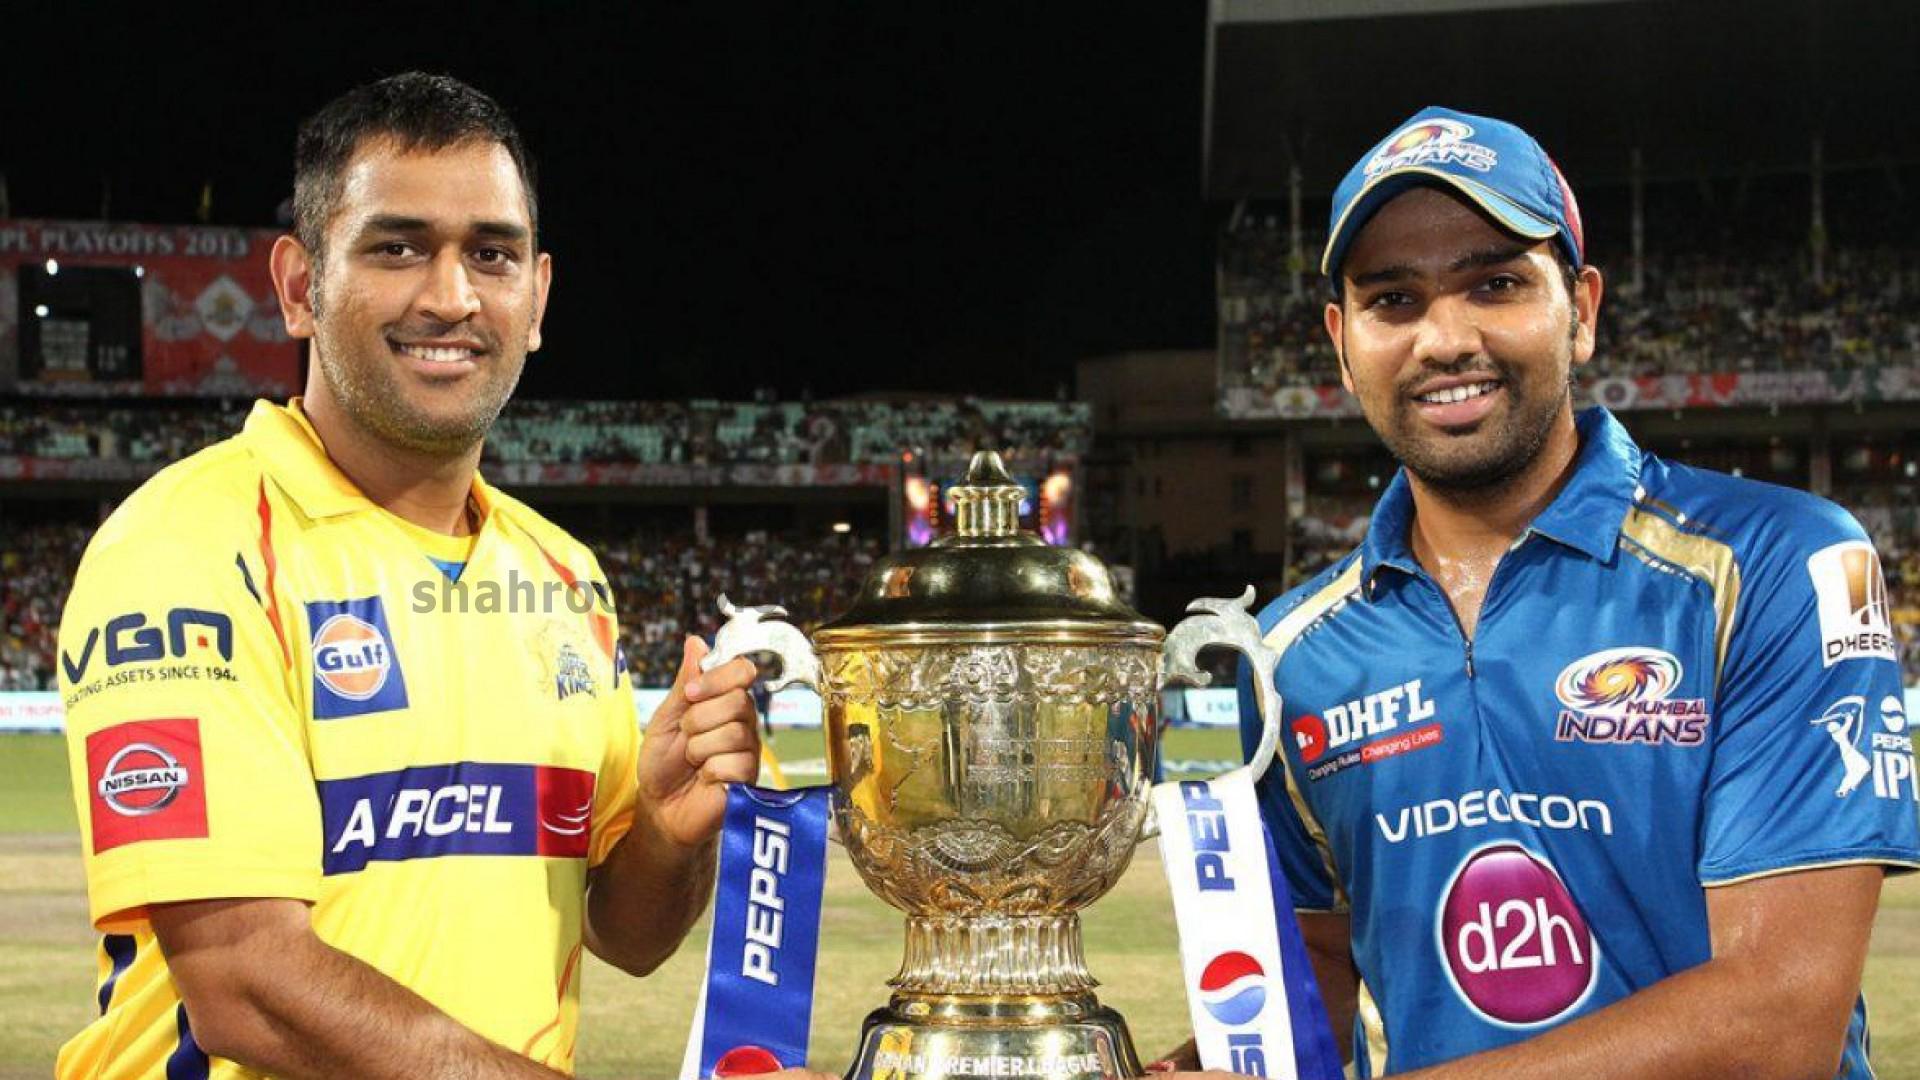 MI vs CSK Who will win the IPL 2018 opening matchWinner 1920x1080